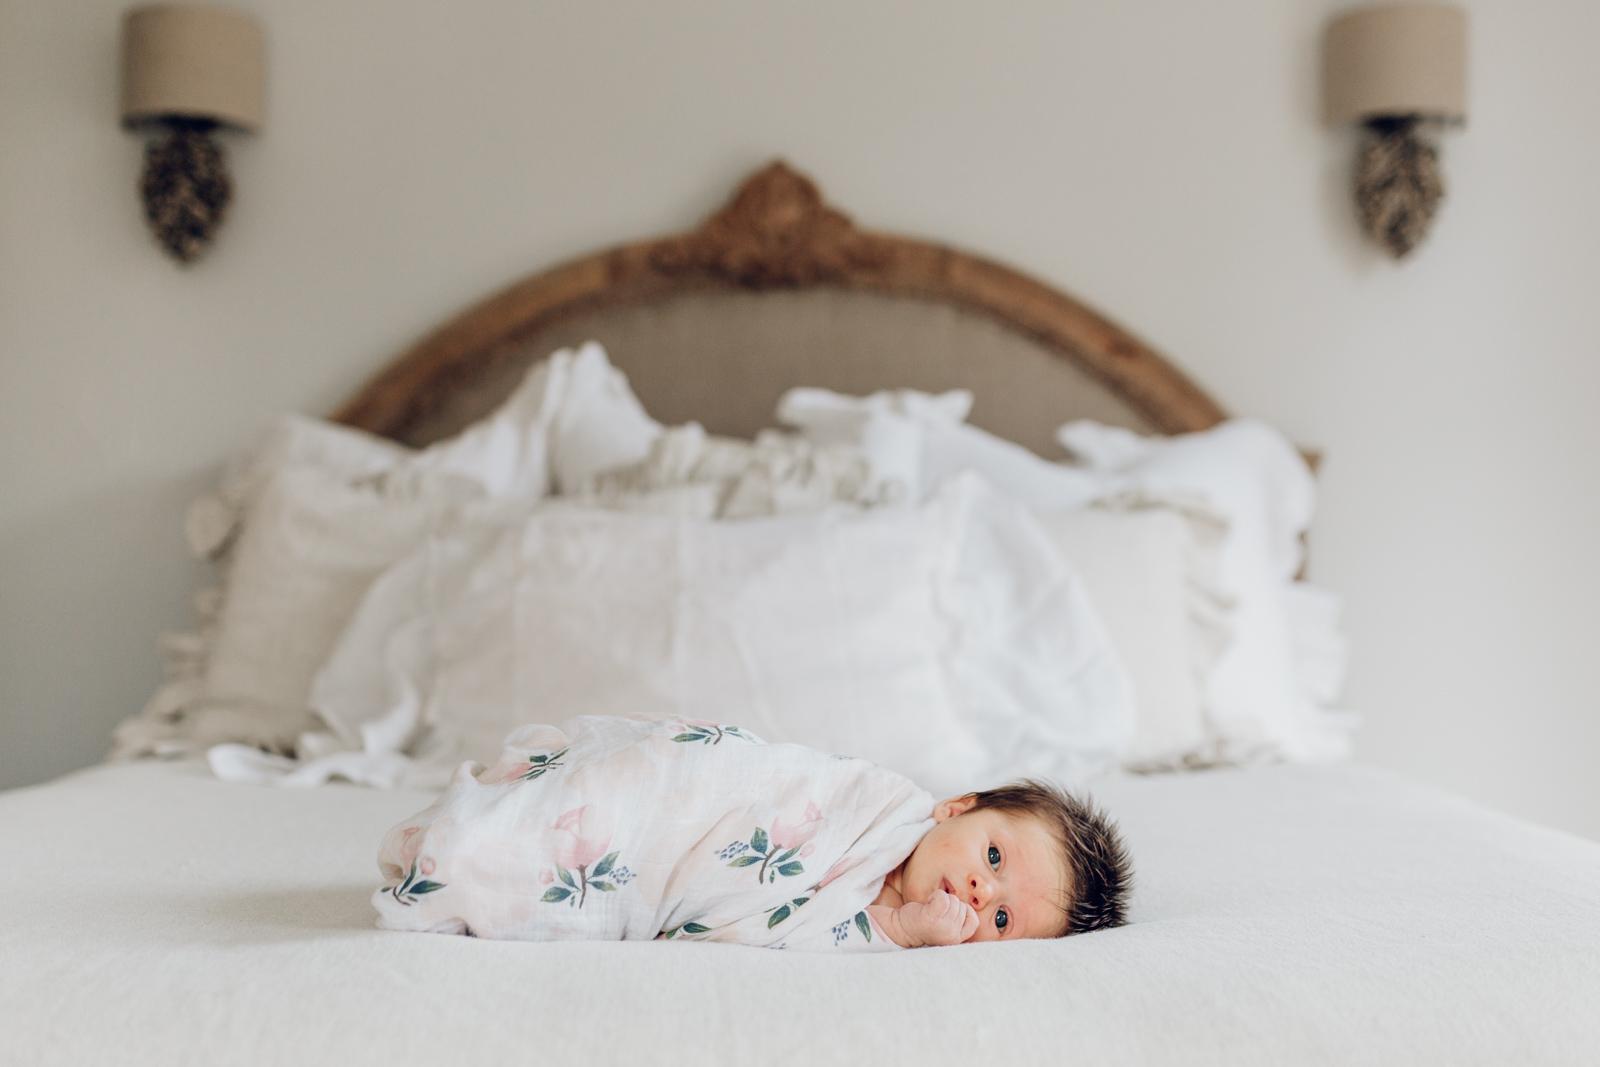 lifestyle-newborn-photography-session-laura-barr-02.jpg